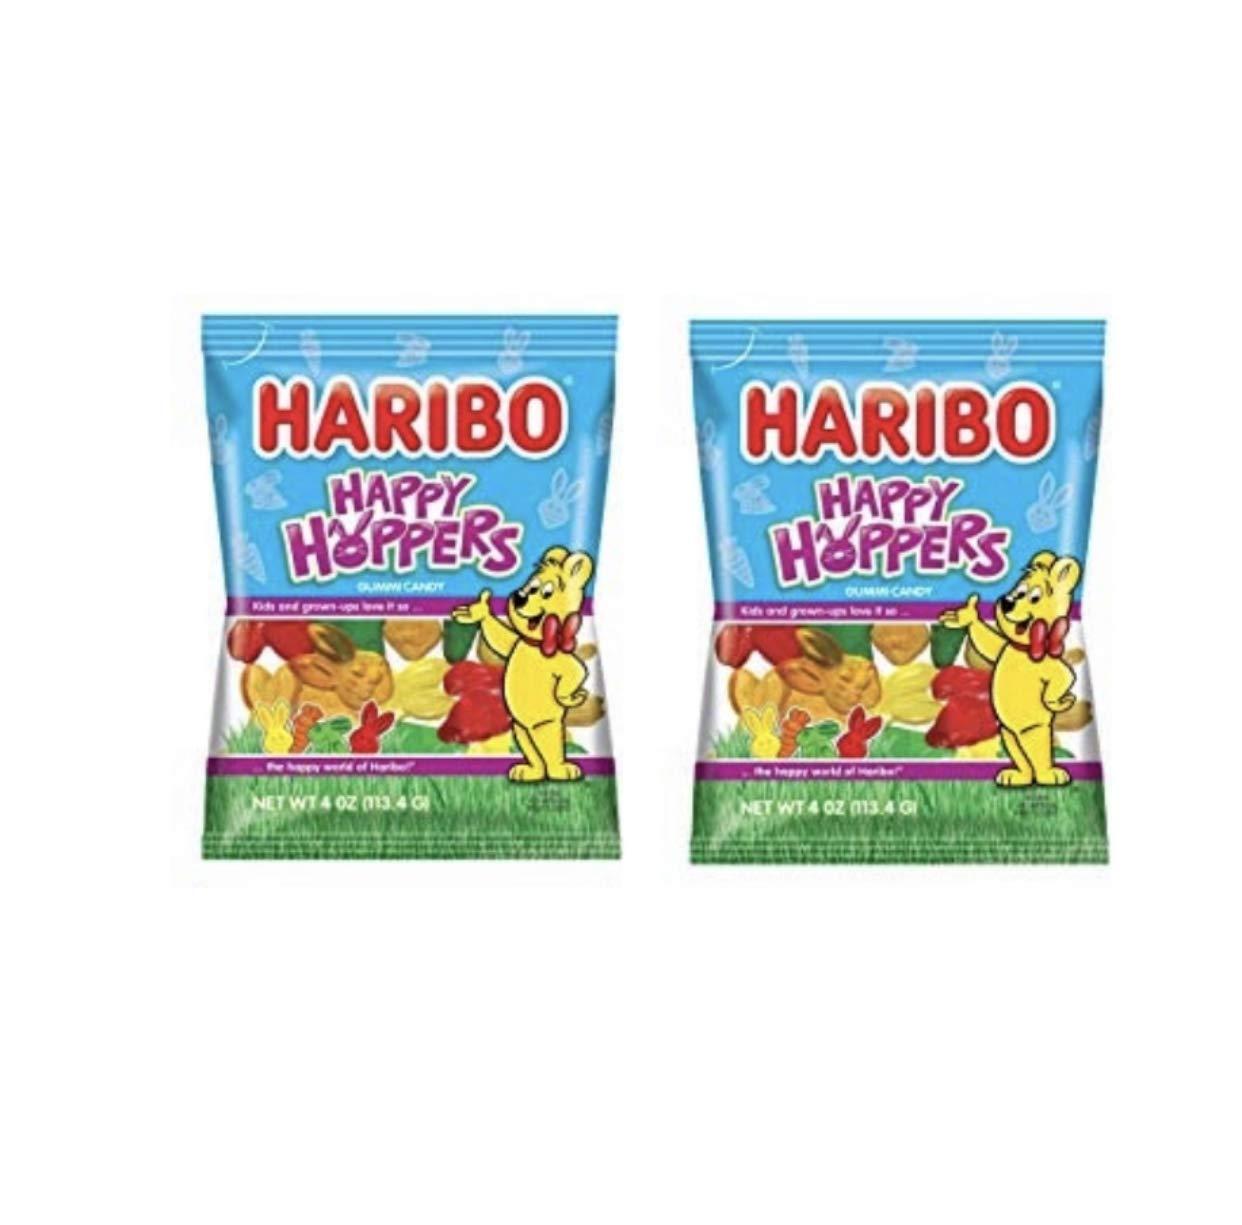 Haribo Happy Hoppers Gummi Ranking TOP9 Candy 4 2 overseas oz Pack